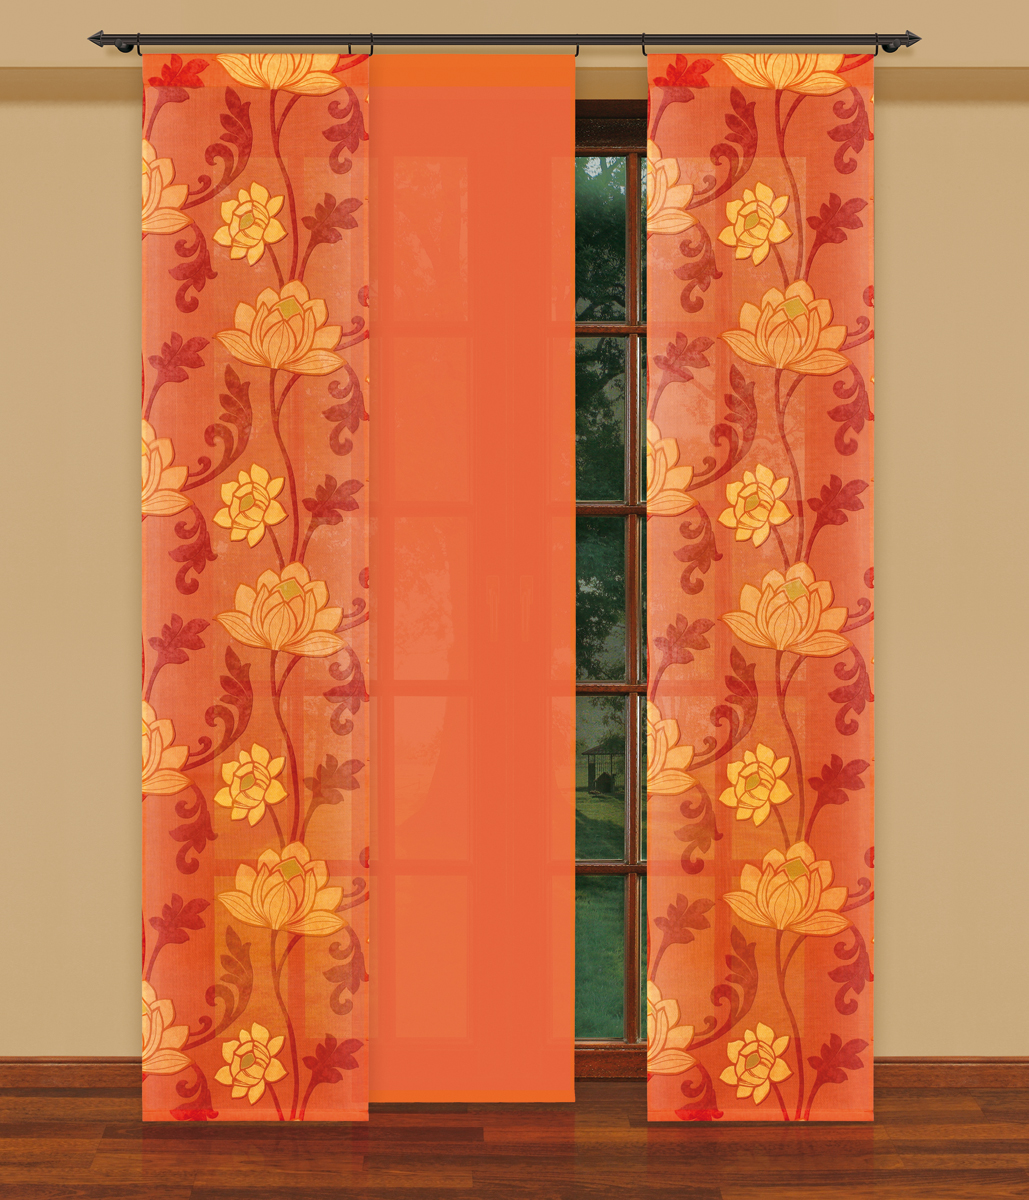 Гардина HAFT 250*50*3. 202240/50 оранжевый1004900000360Гардина XAFT 250*50*3. 202240/50 оранжевыйМатериал: 100% п/э, размер: 250*50*3, цвет: оранжевый